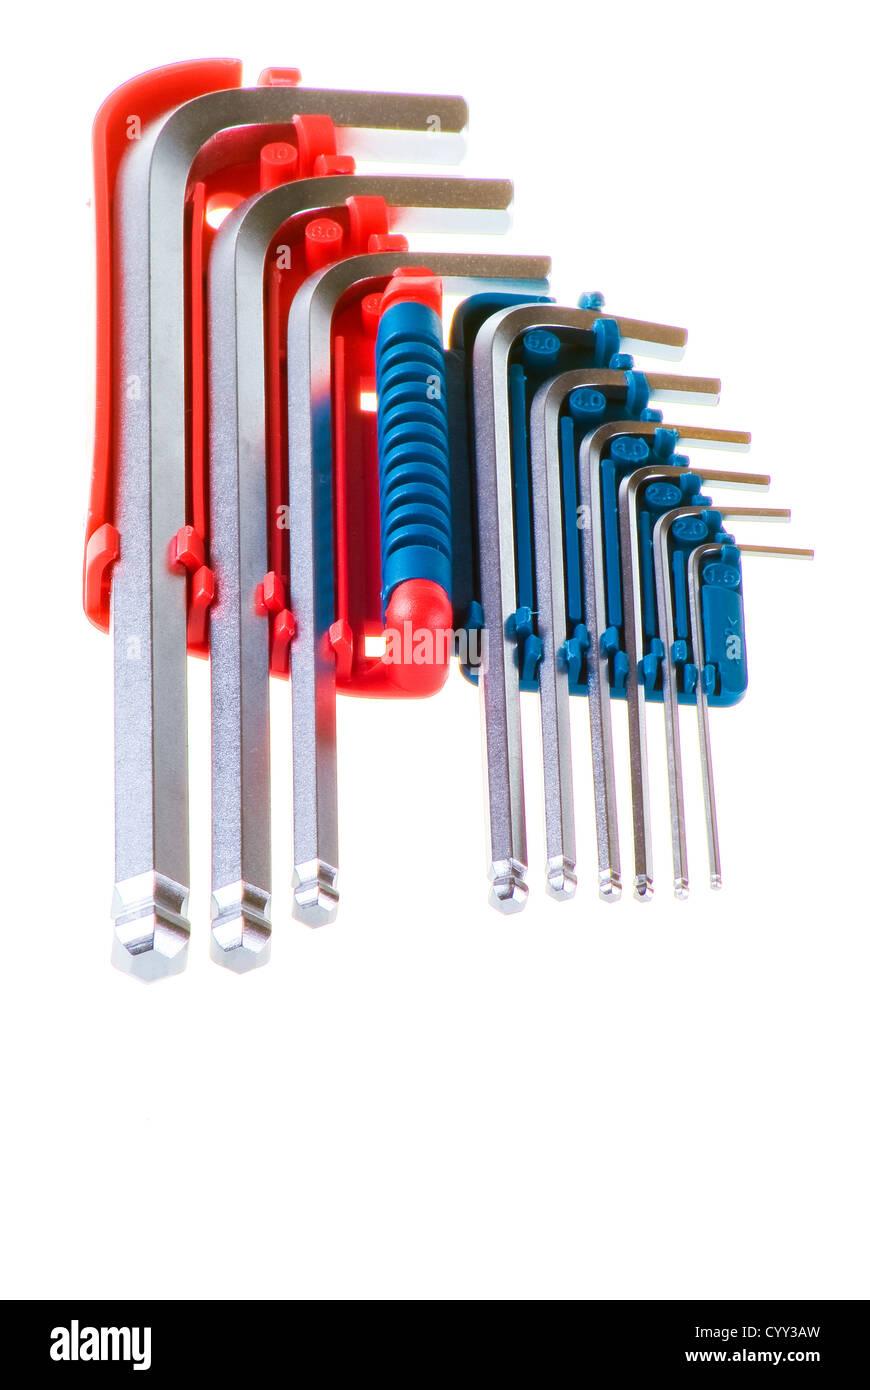 Set of alan keys over white background - Stock Image